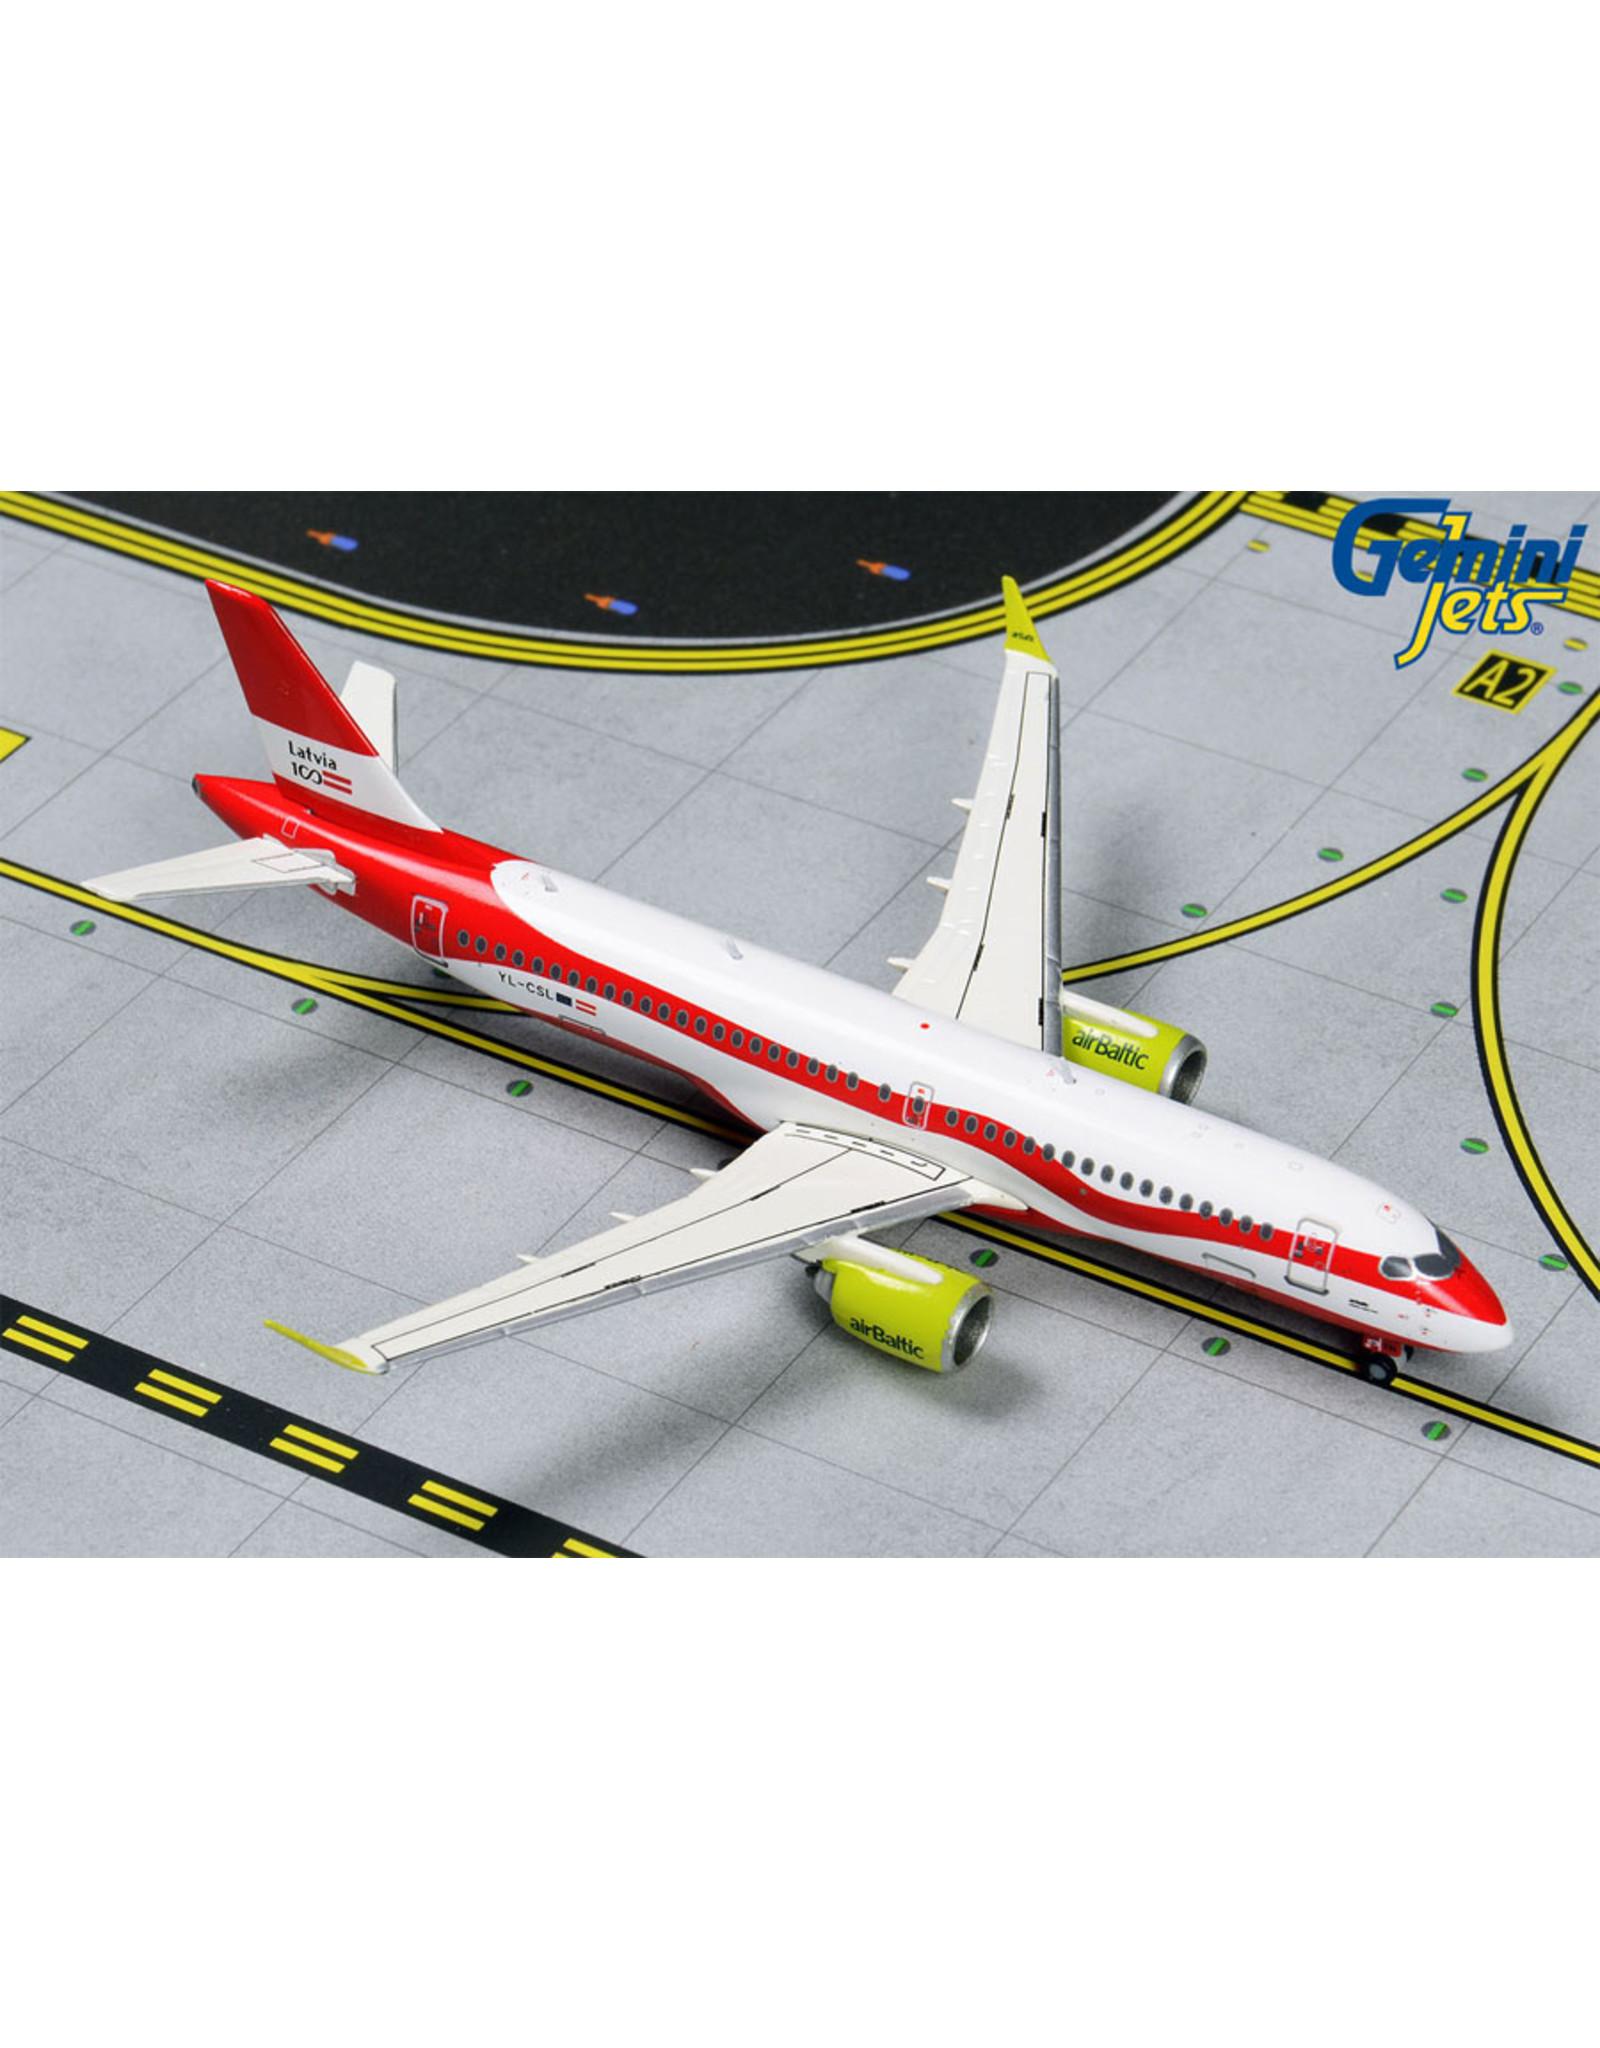 Gemini Gem4 Air Baltic A220-300 Latvia 100